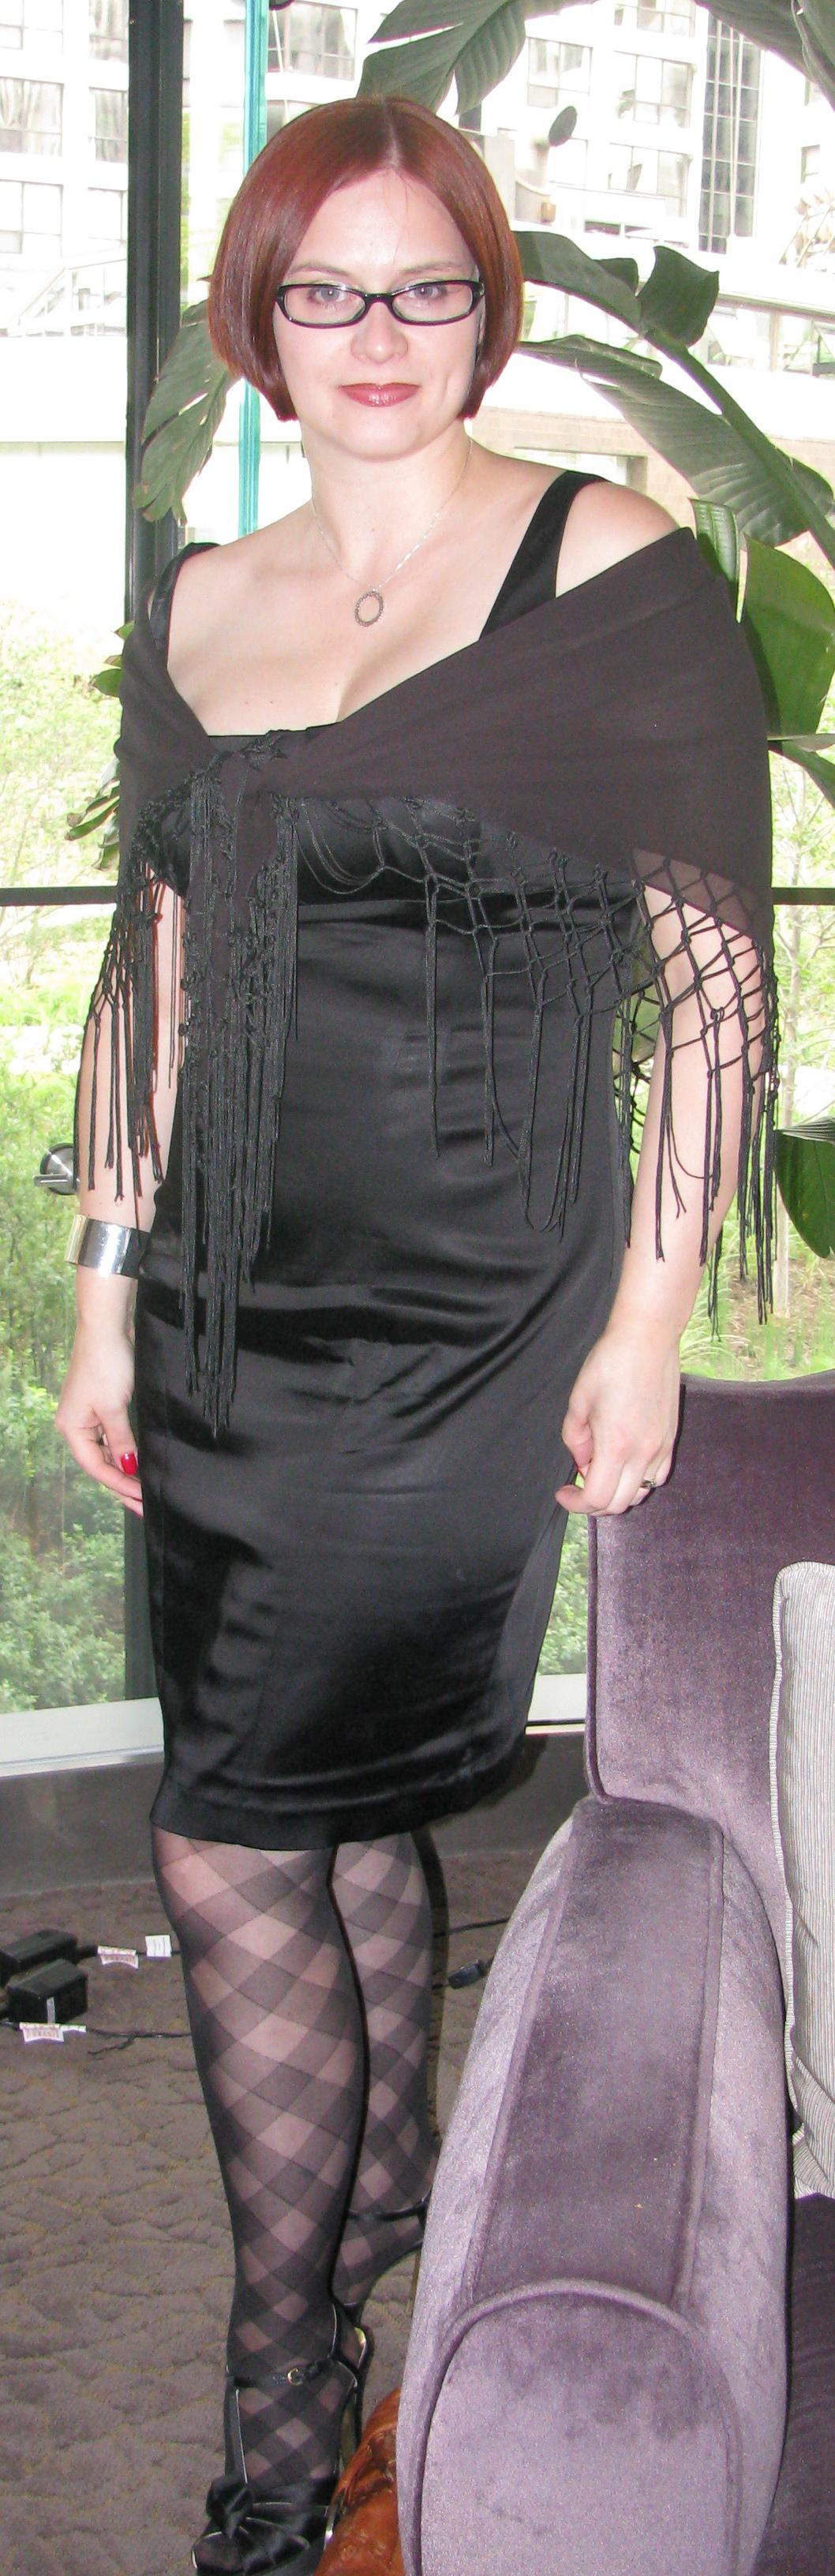 Katja Presnal - Blogher 2009